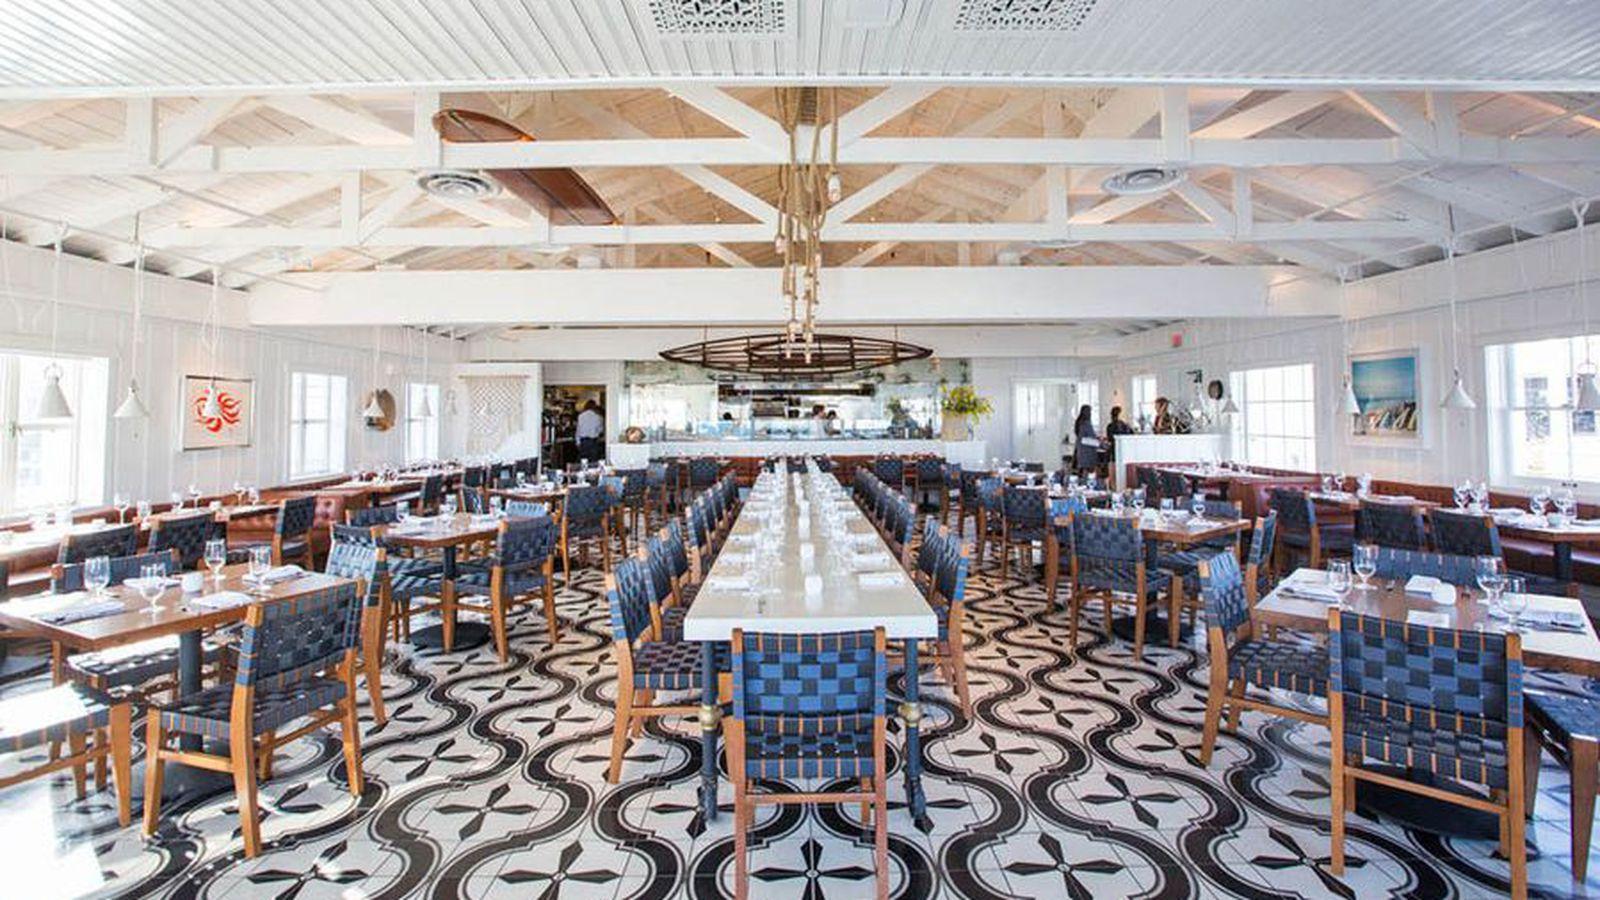 Malibu Farm Takes Over Malibu Pier Restaurant As Chef